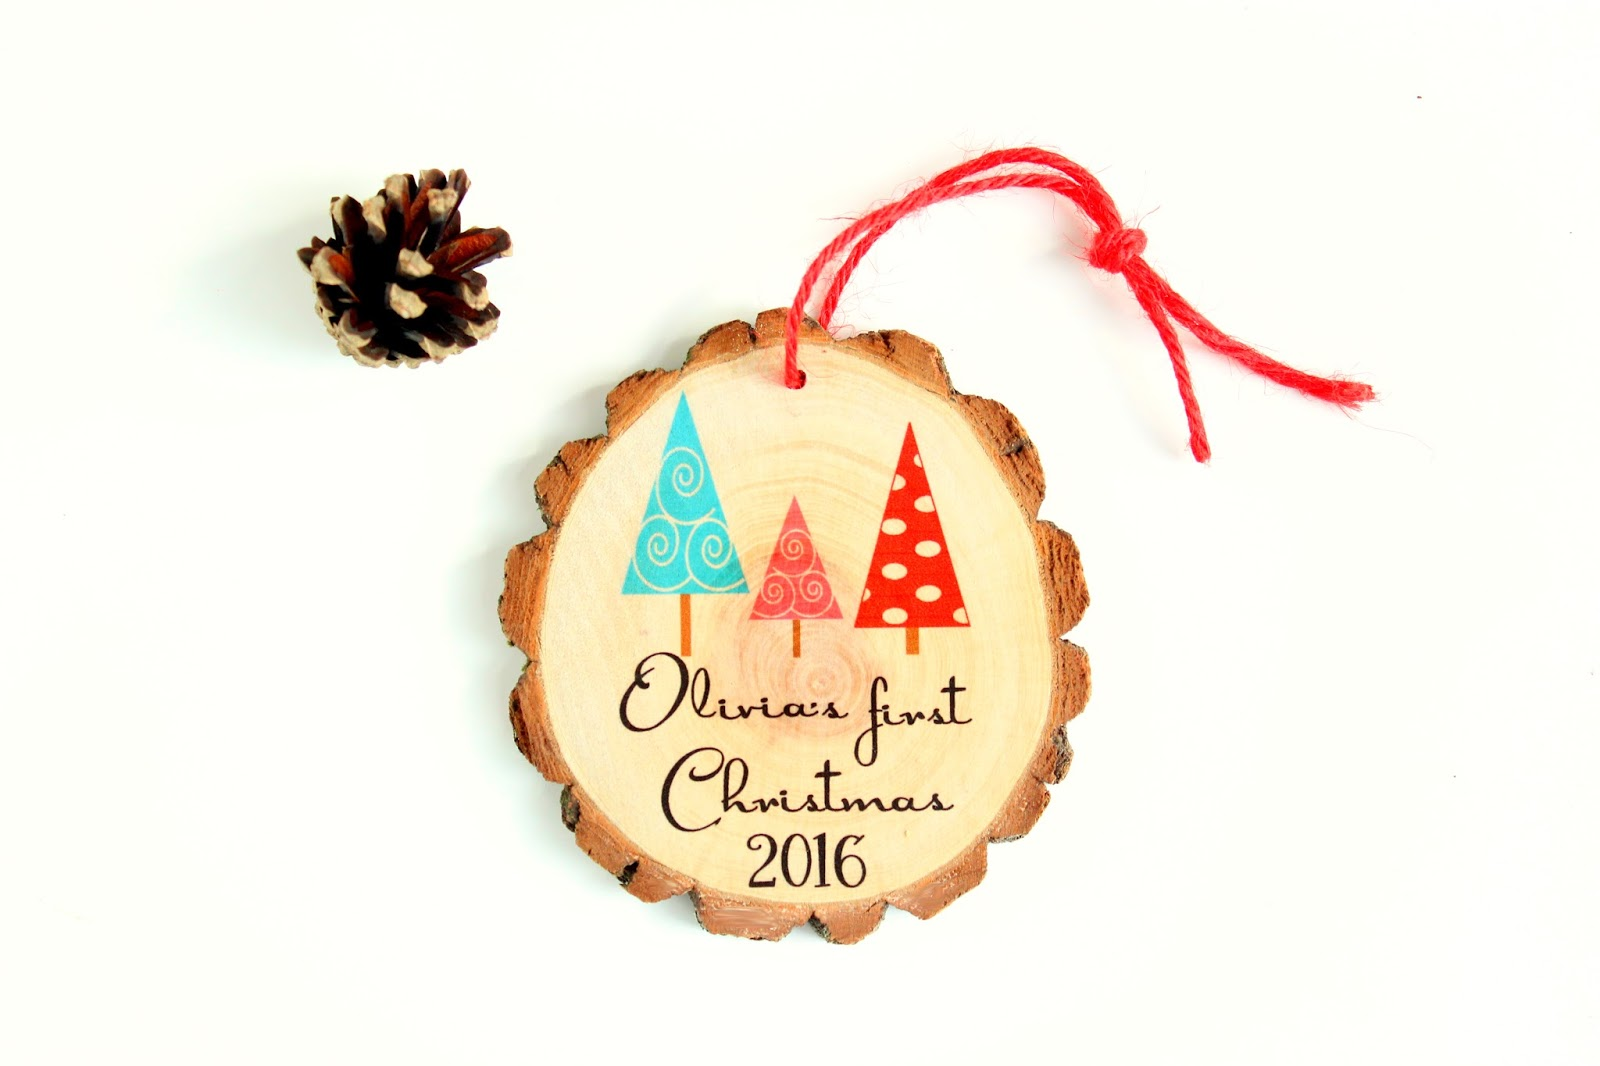 Christmas ornaments for baby - Custom Family Ornaments